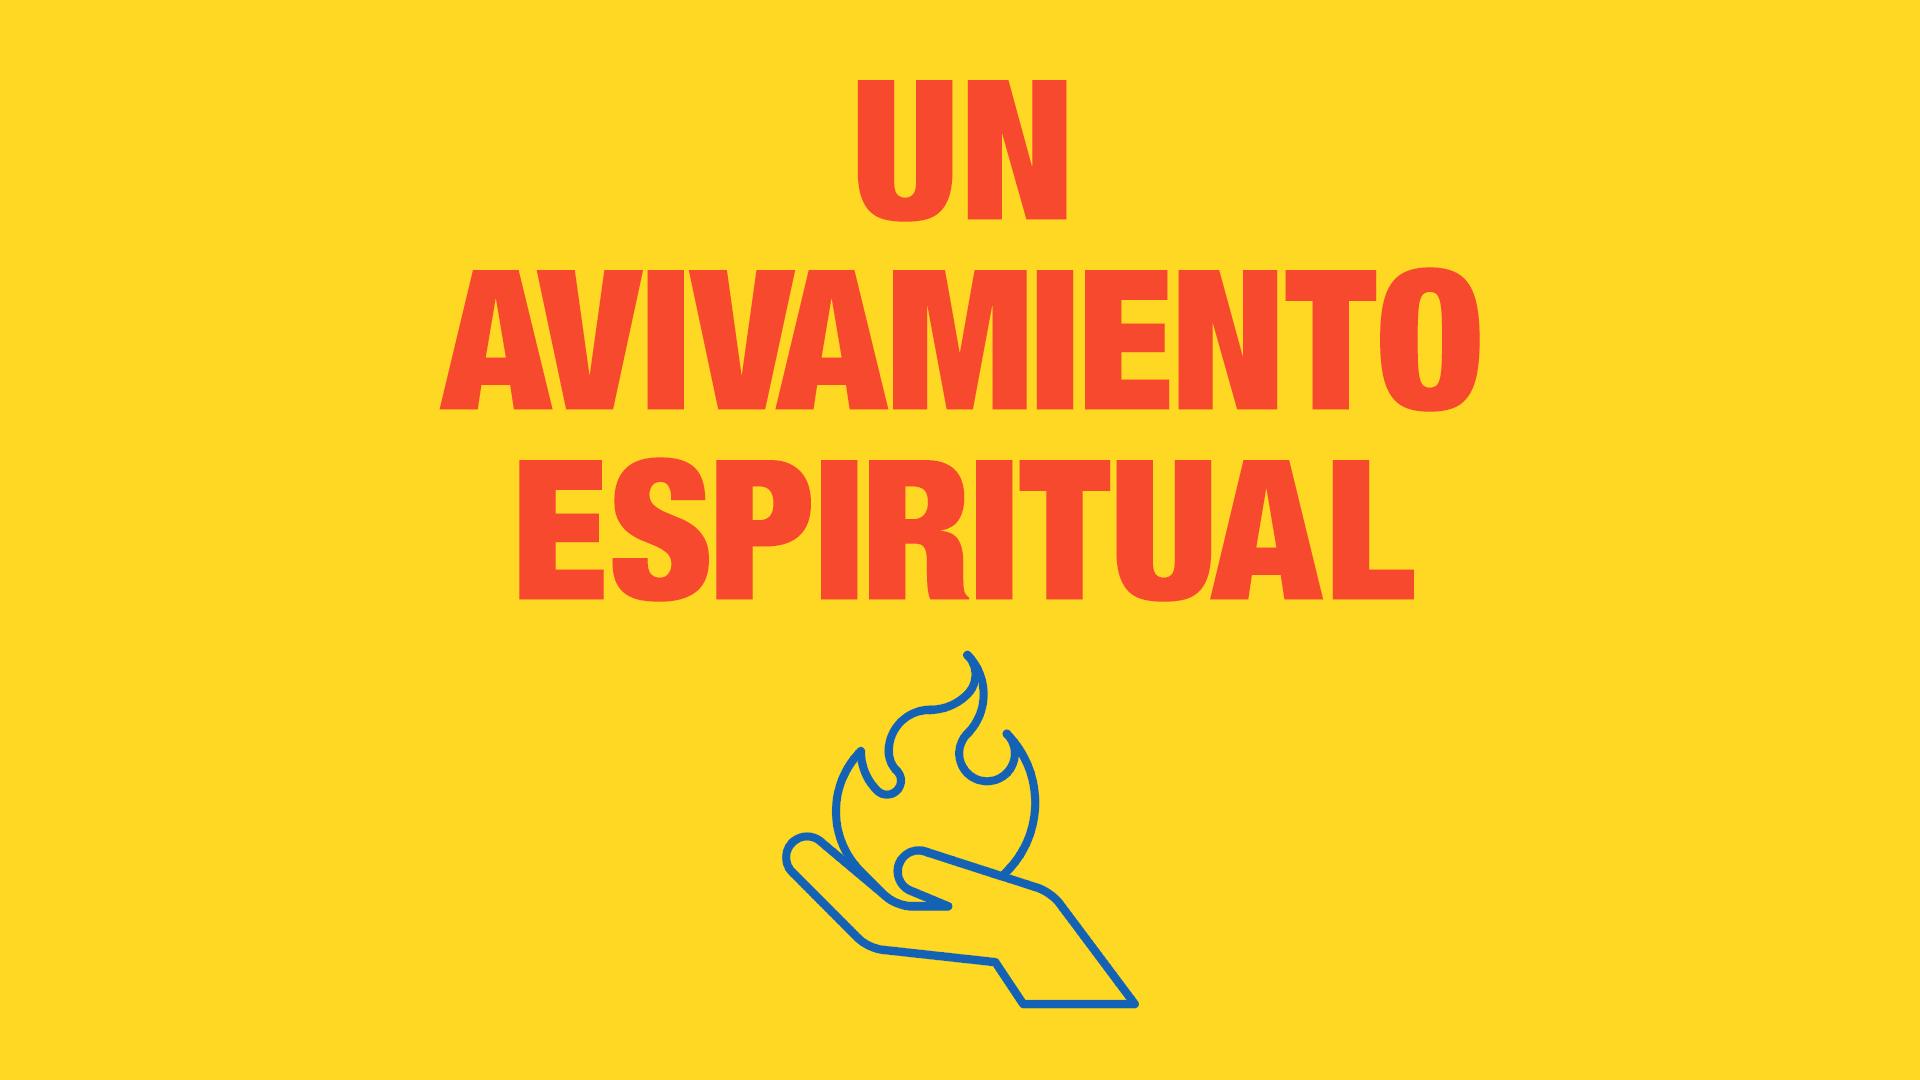 un avivamiento espiritual - 25 NOV.jpg